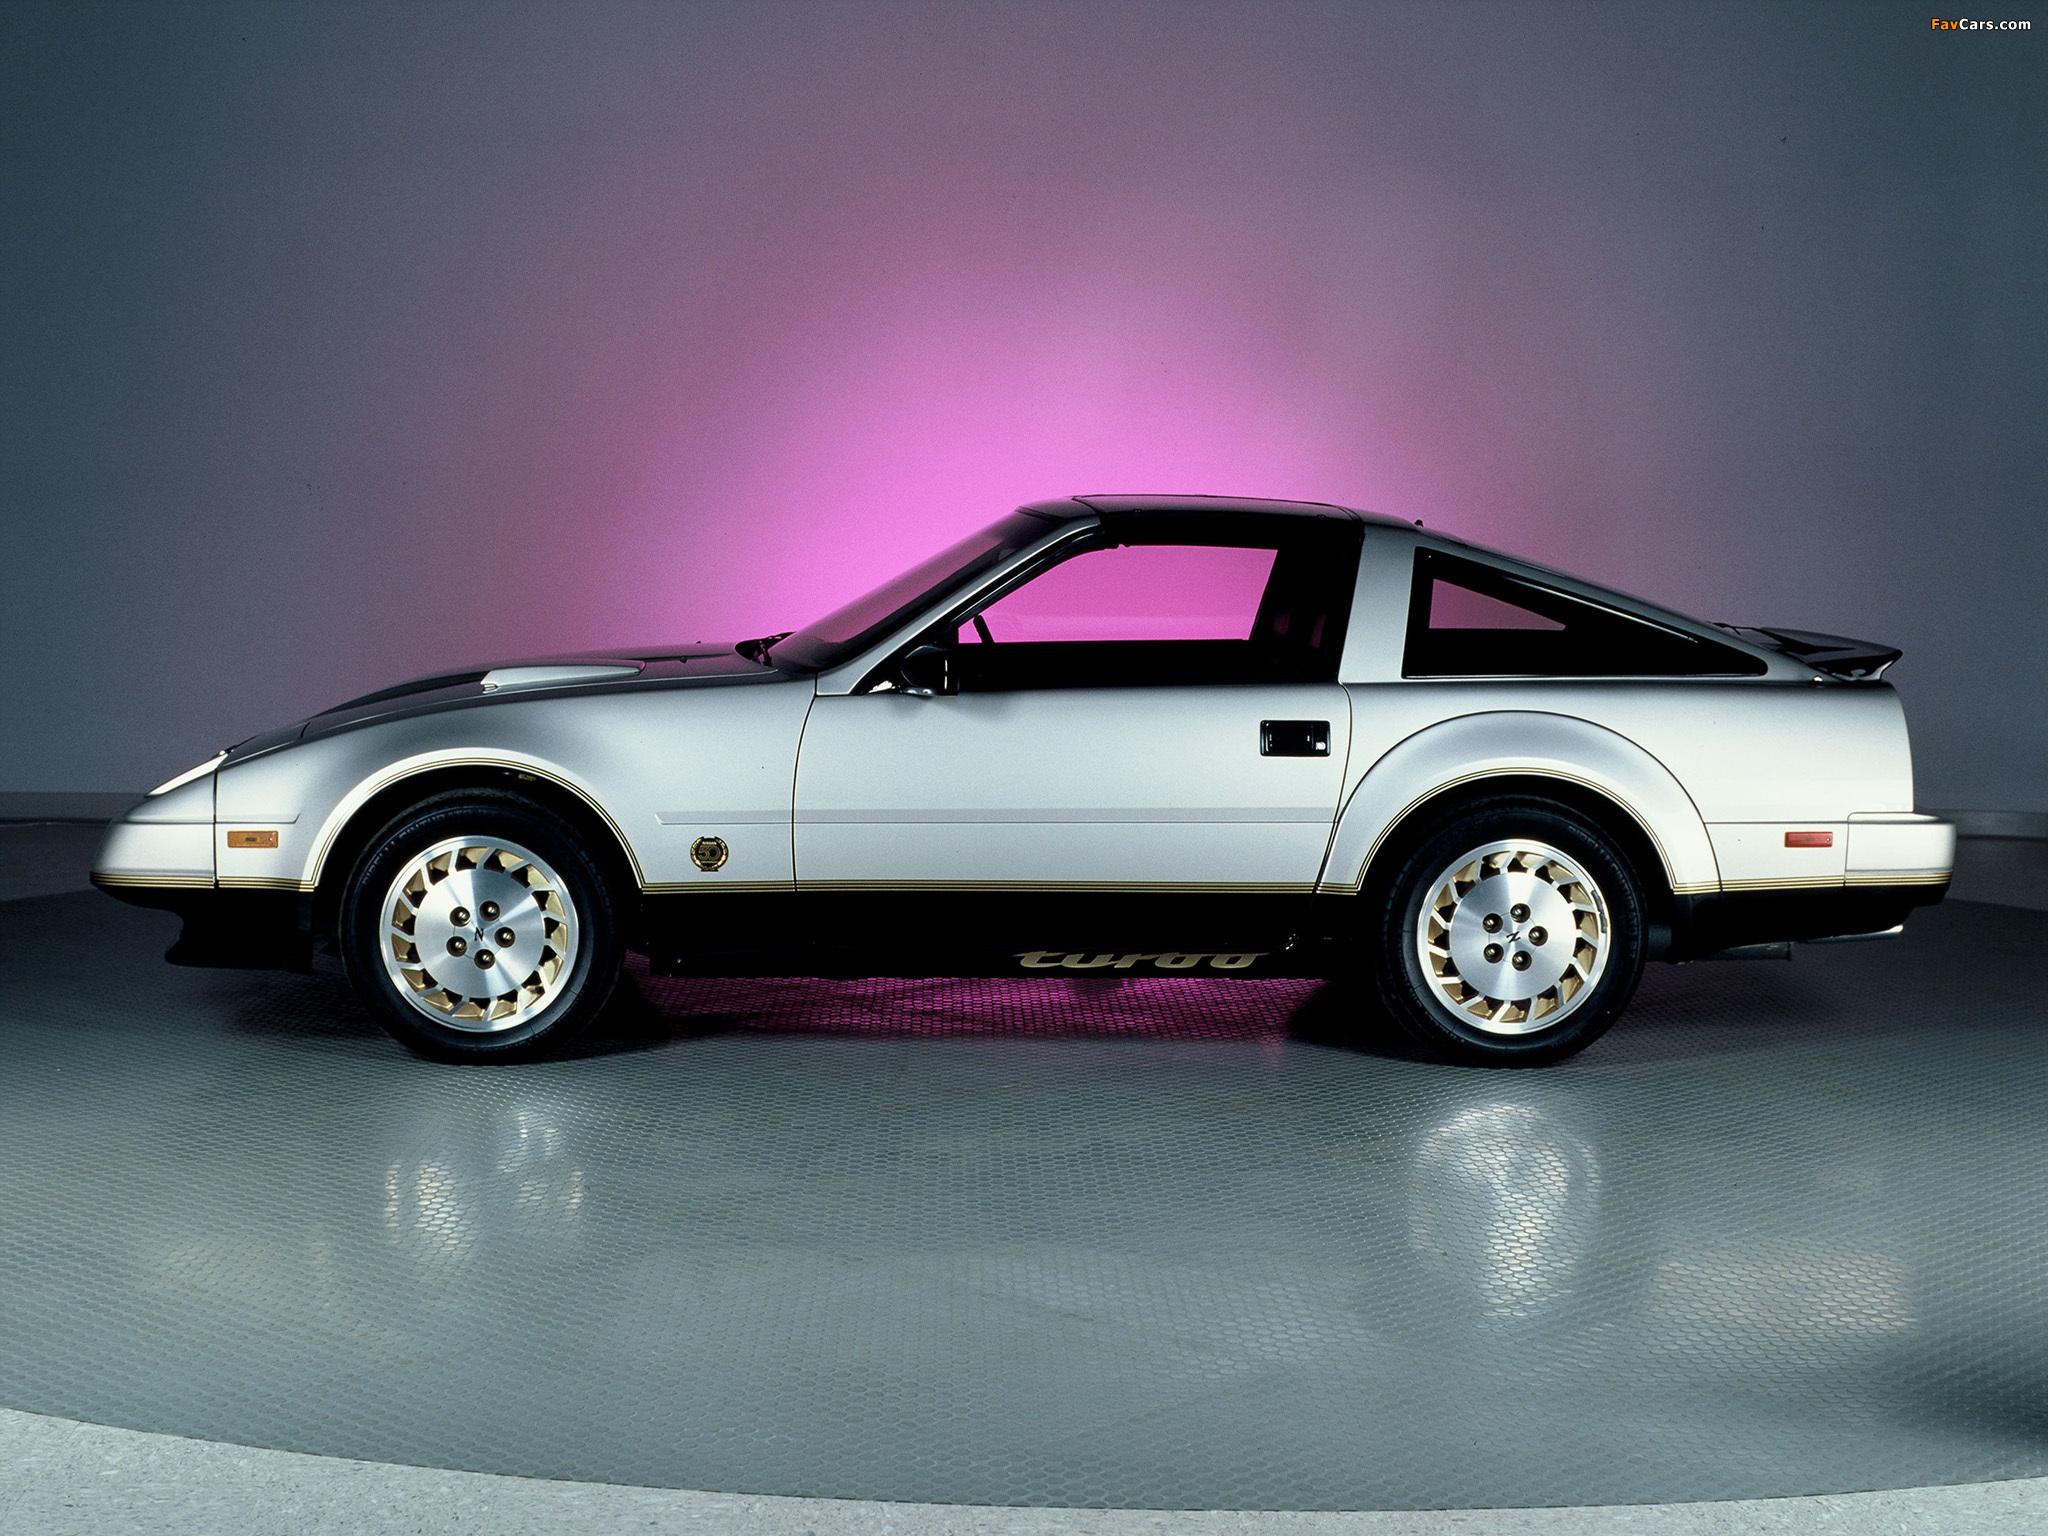 Nissan 300ZX 50th Anniversary Z31 1984 wallpapers 2048x1536 2048x1536